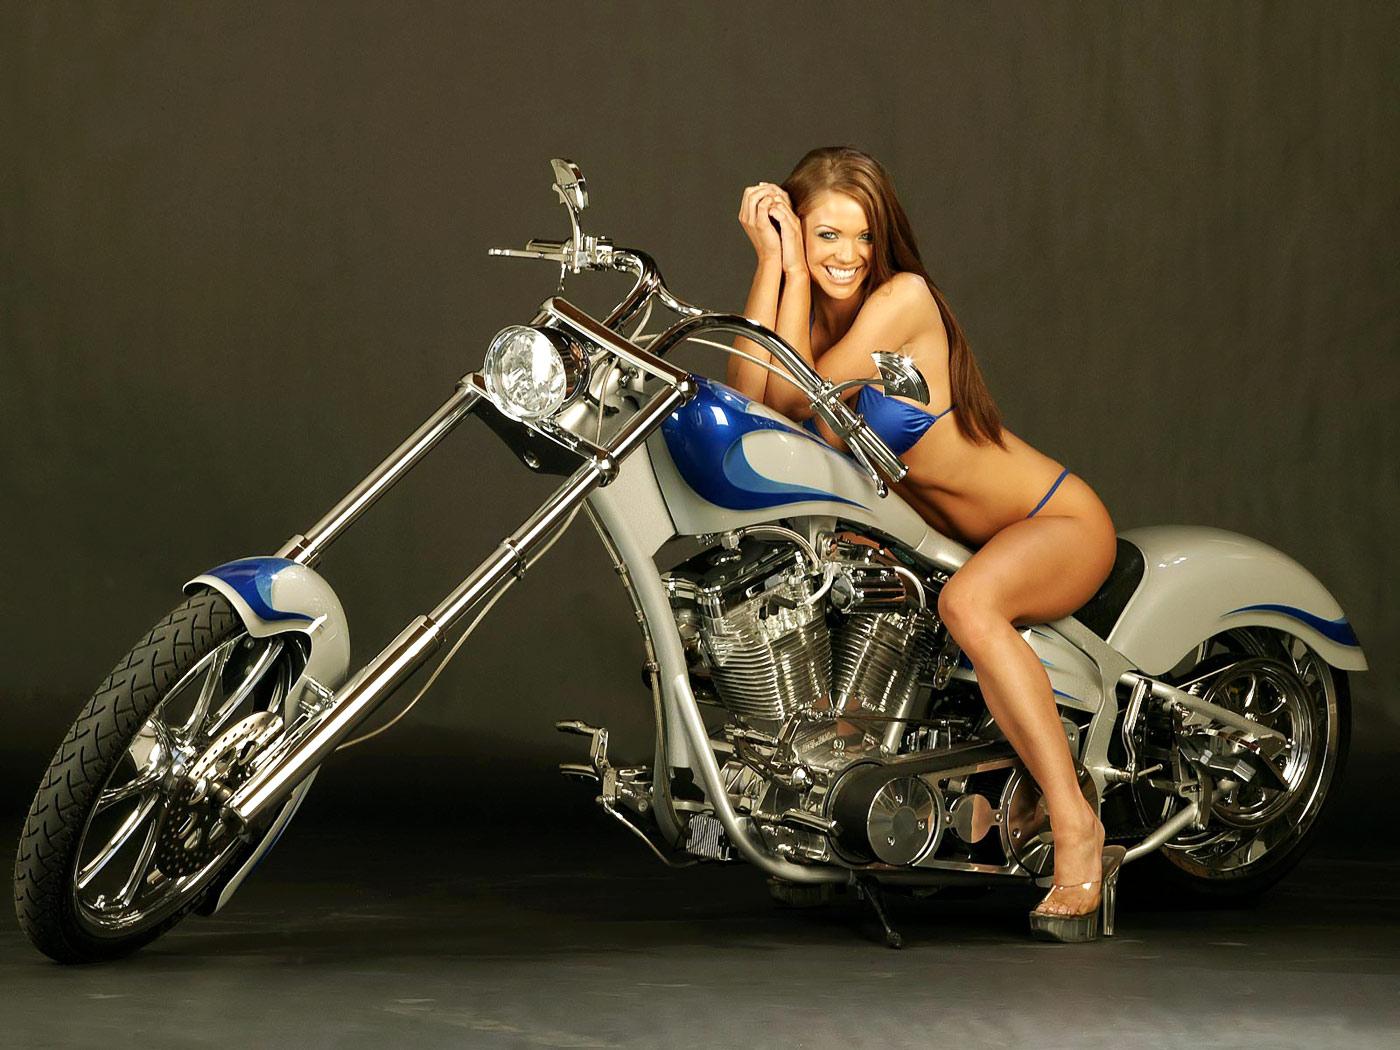 Girls On Harley-Davidson Motorcycles 1400 x 1050 · 261 kB · jpeg